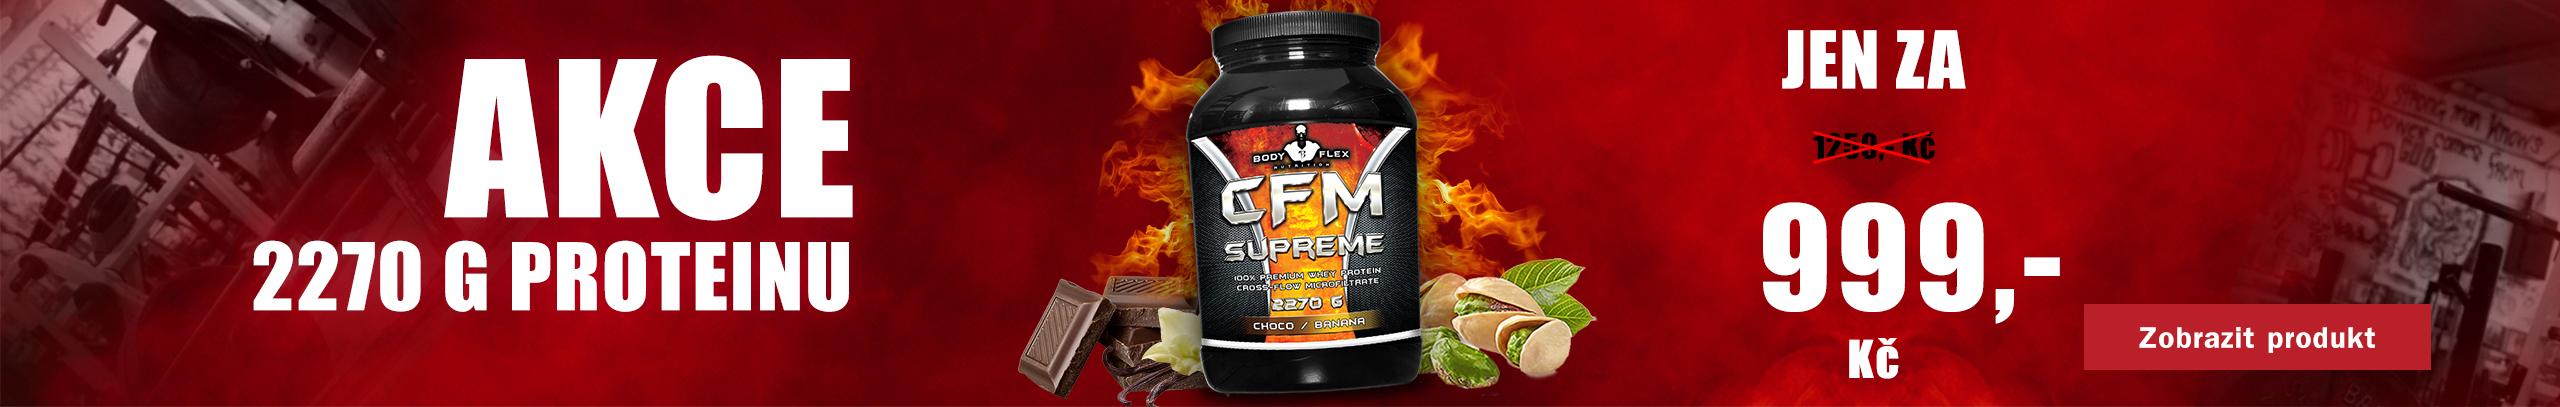 CFM Supreme v AKCI